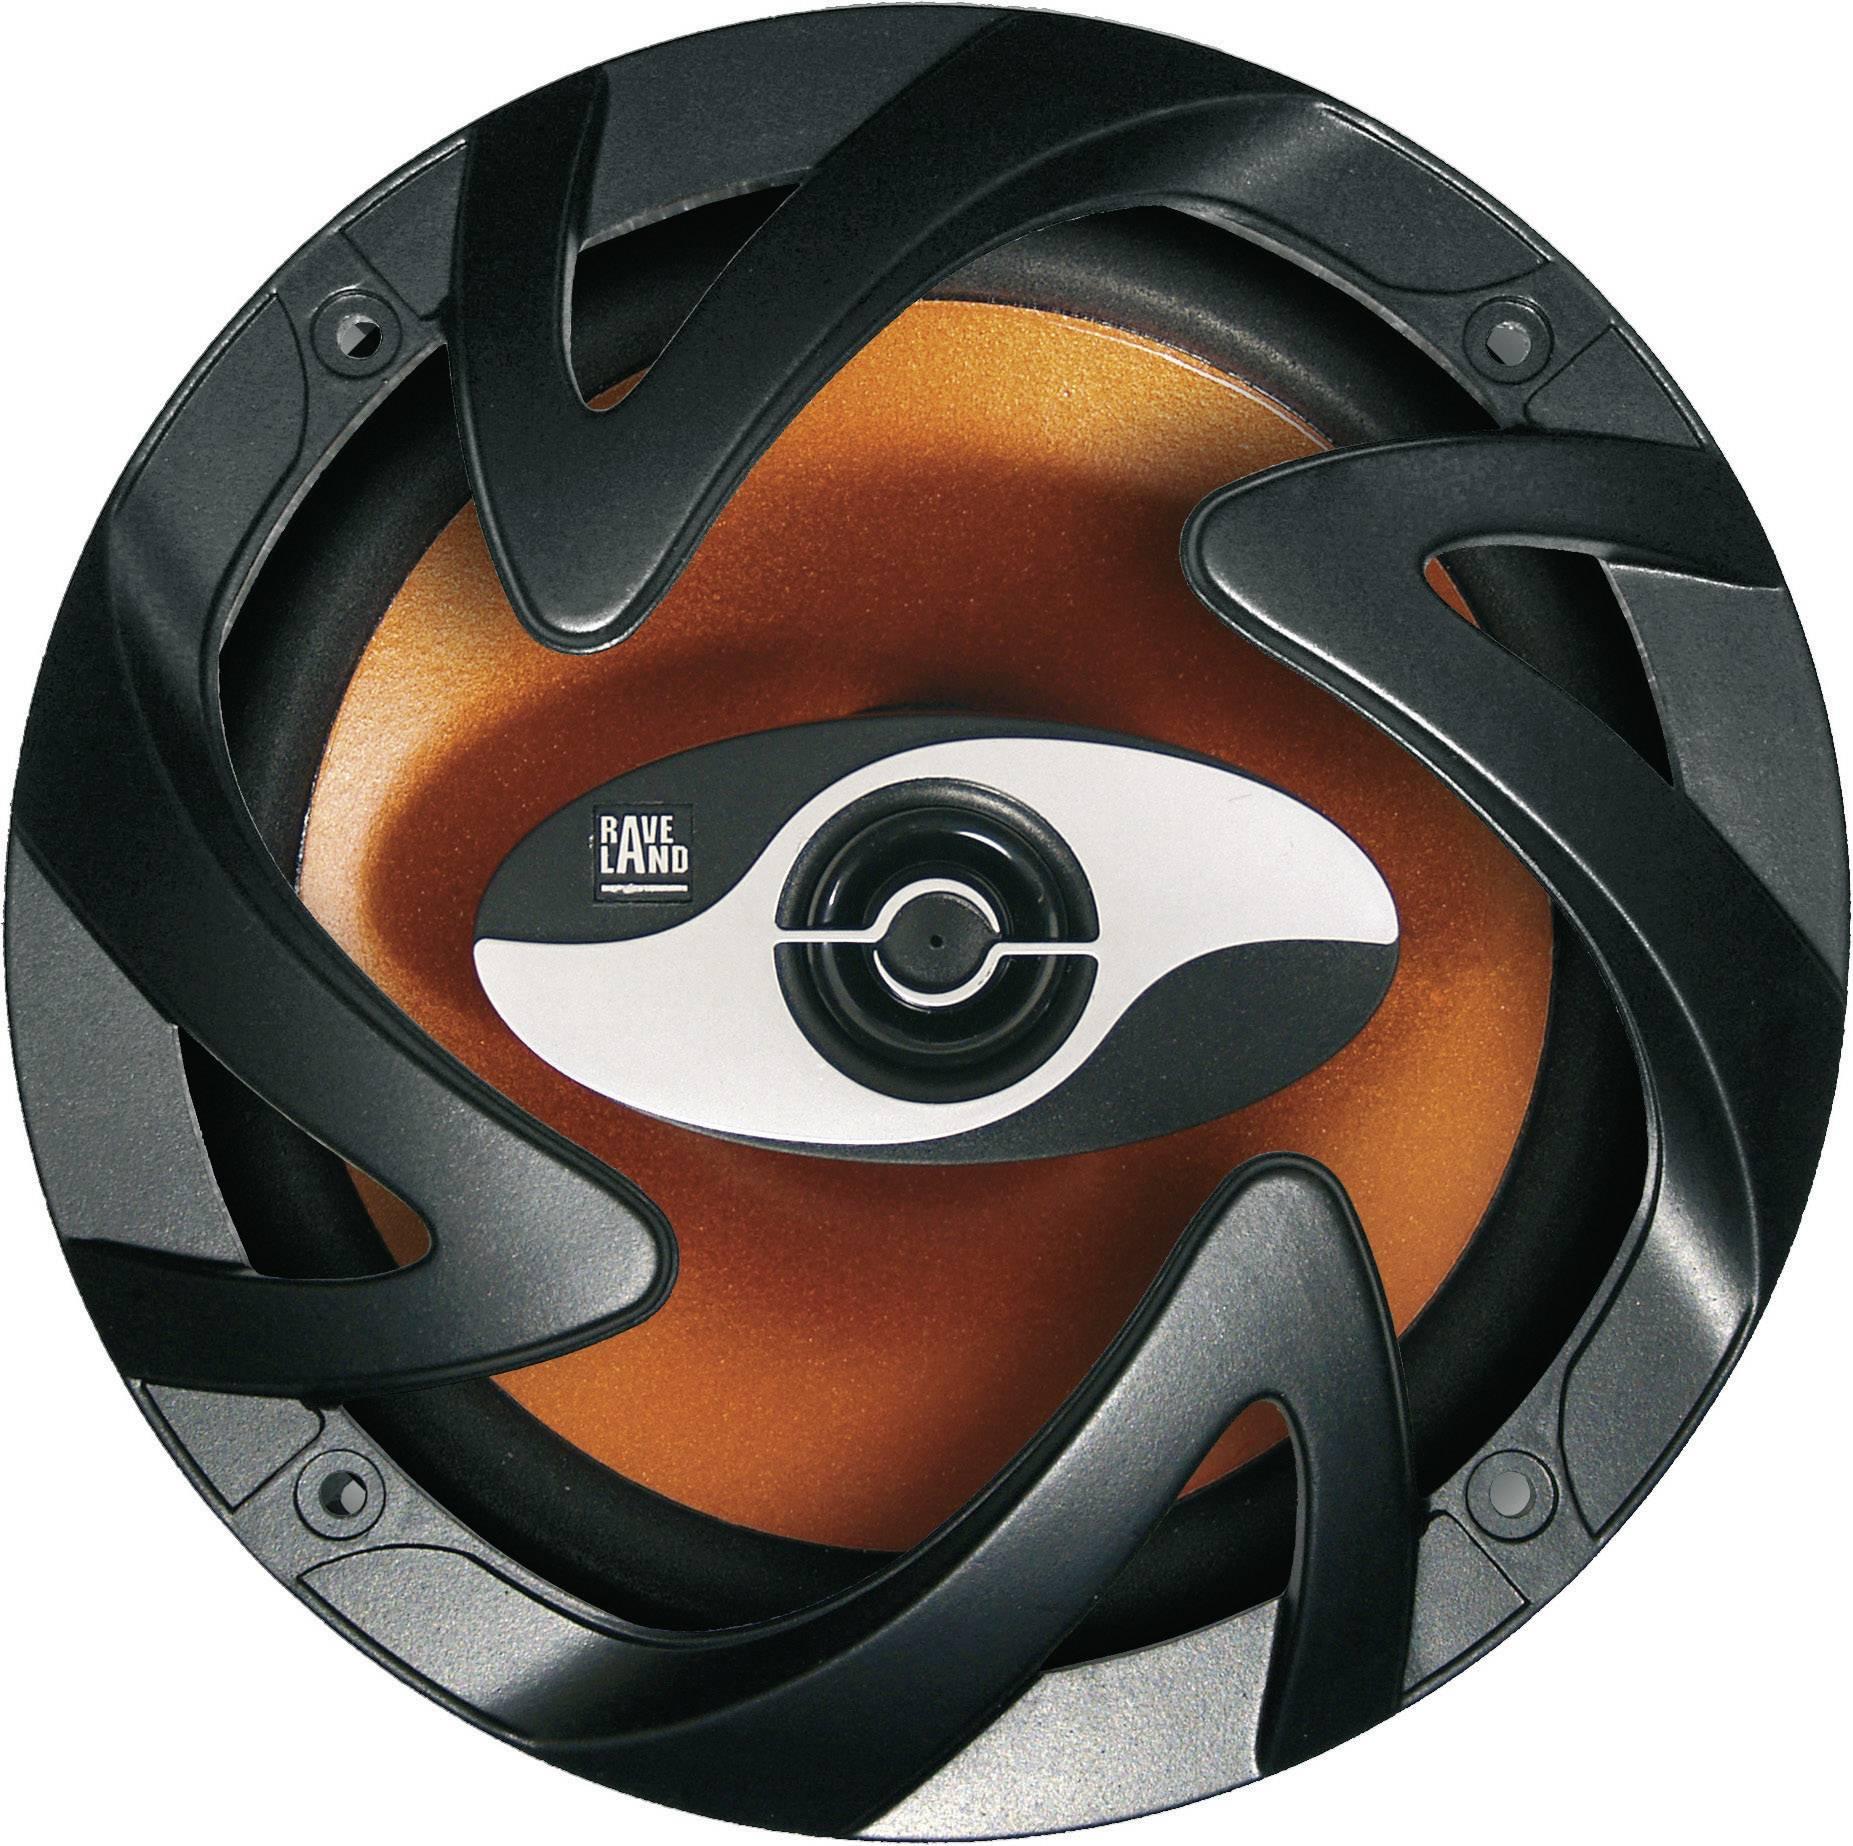 Hi-Fi súprava do auta Raveland XAB-5000 MKII Orange Power, 4 x 300 W